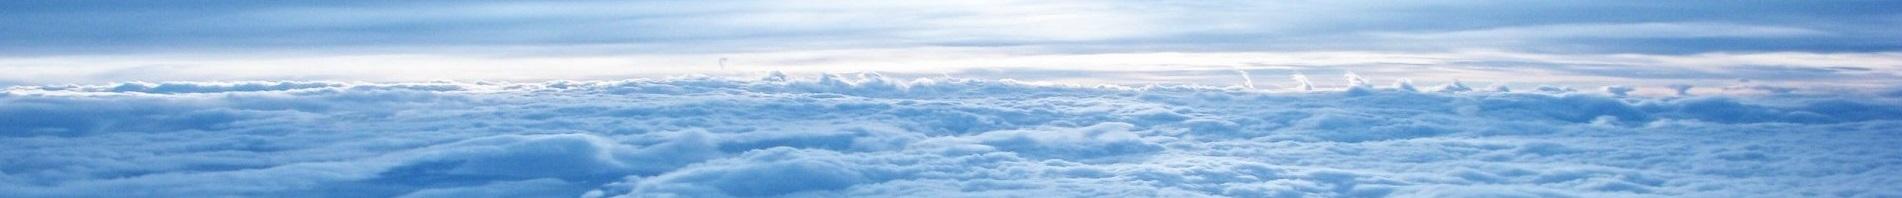 flight-wallpapers-airplane-window-higher-title-sky-cloudsLP3.jpg